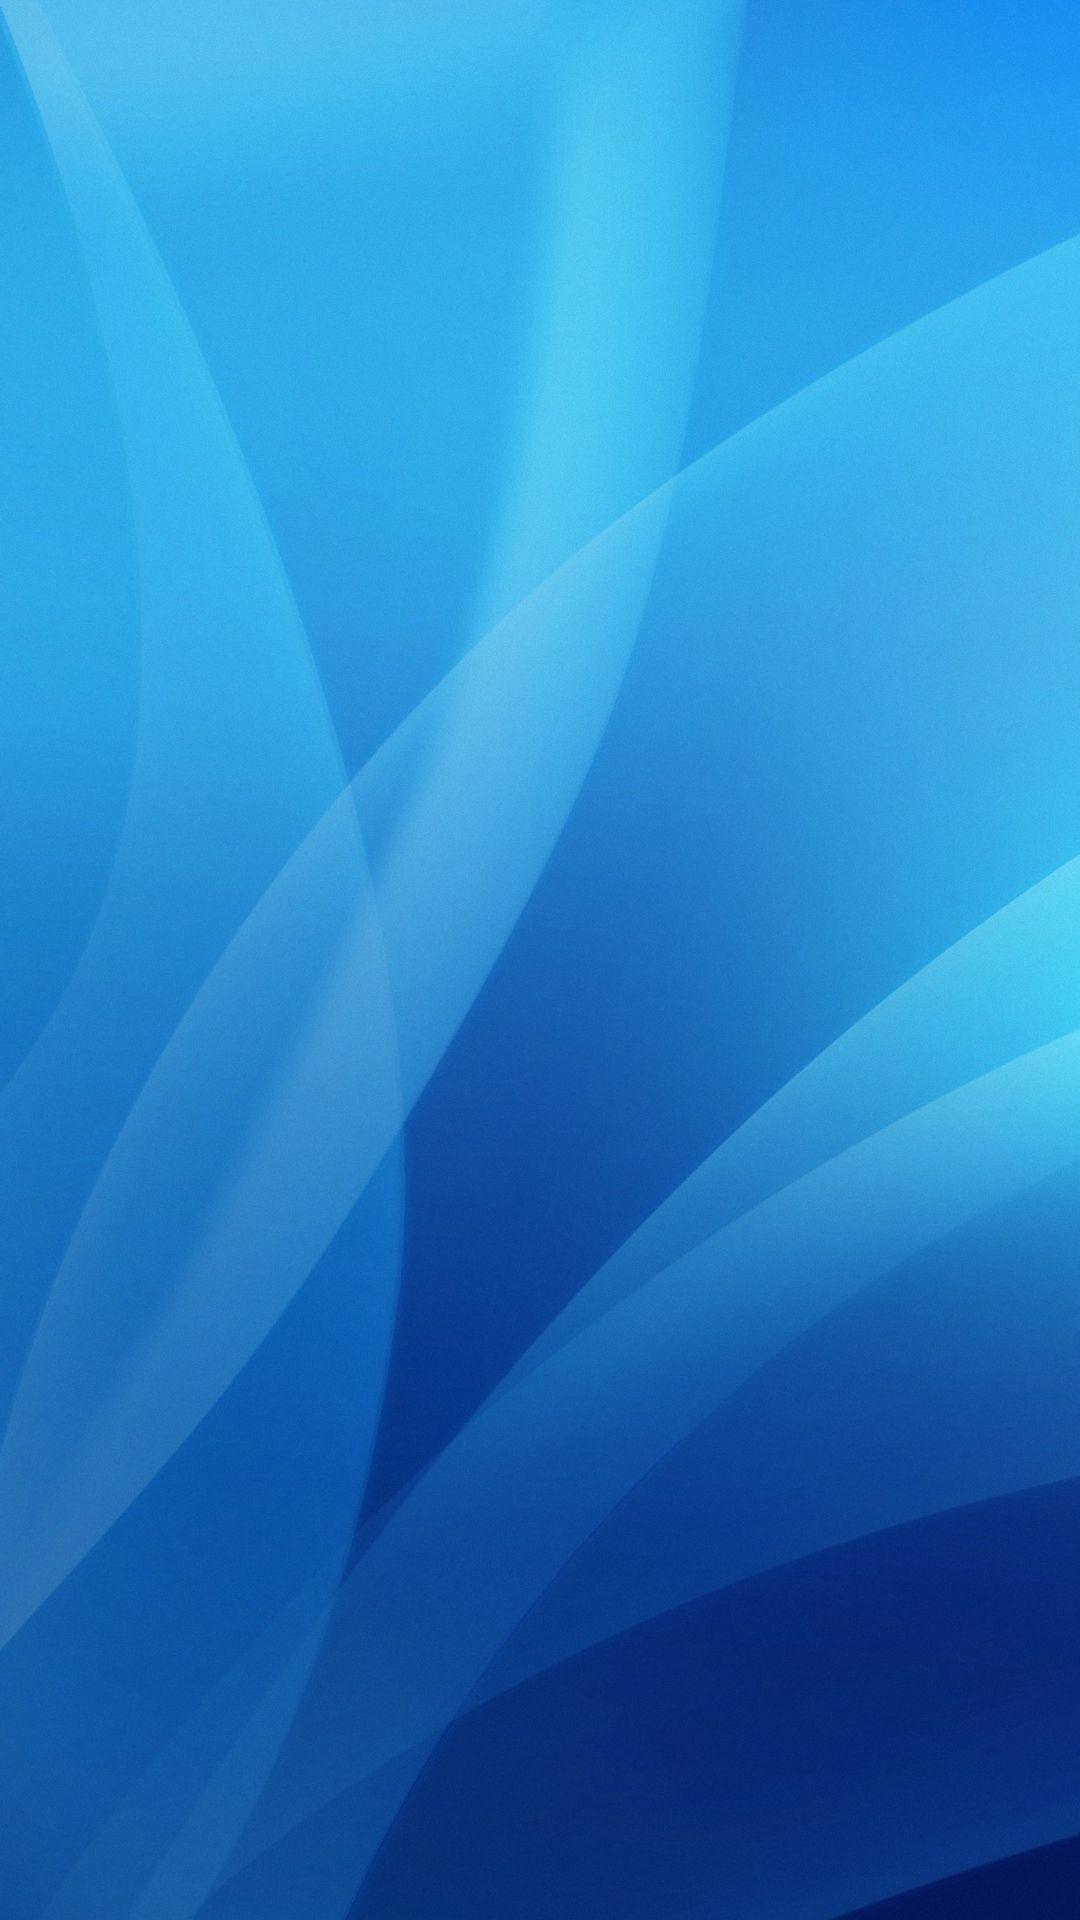 Dream Of Blue Samsung Galaxy A7 Wallpapers Hd   Samsung Blue Hd 1080x1920